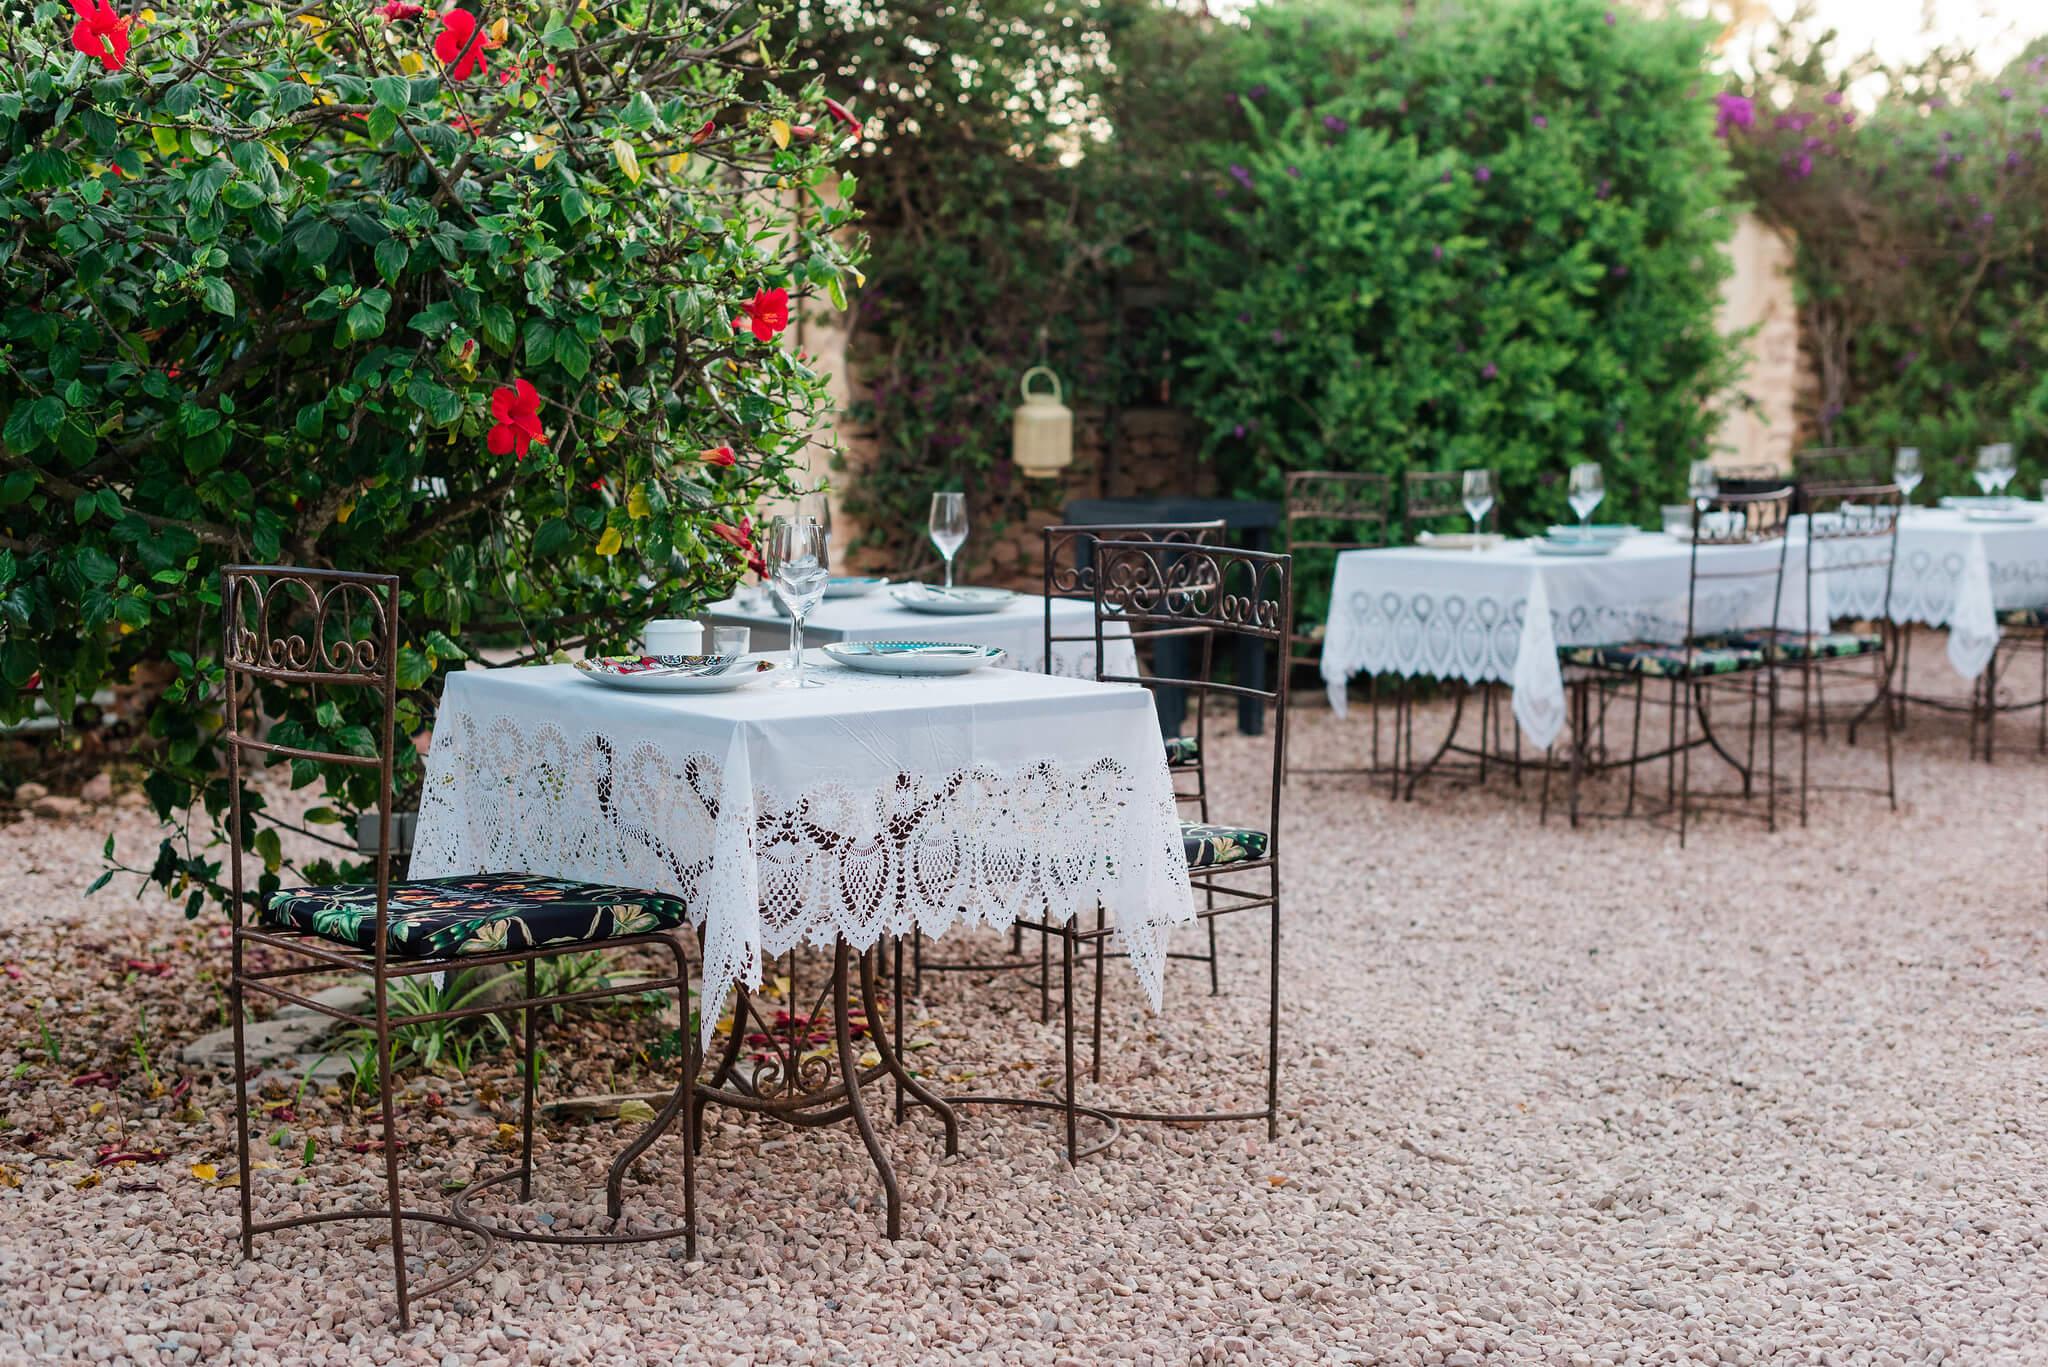 https://www.white-ibiza.com/wp-content/uploads/2020/03/formentera-restaurants-a-mi-manera-2020-05.jpg